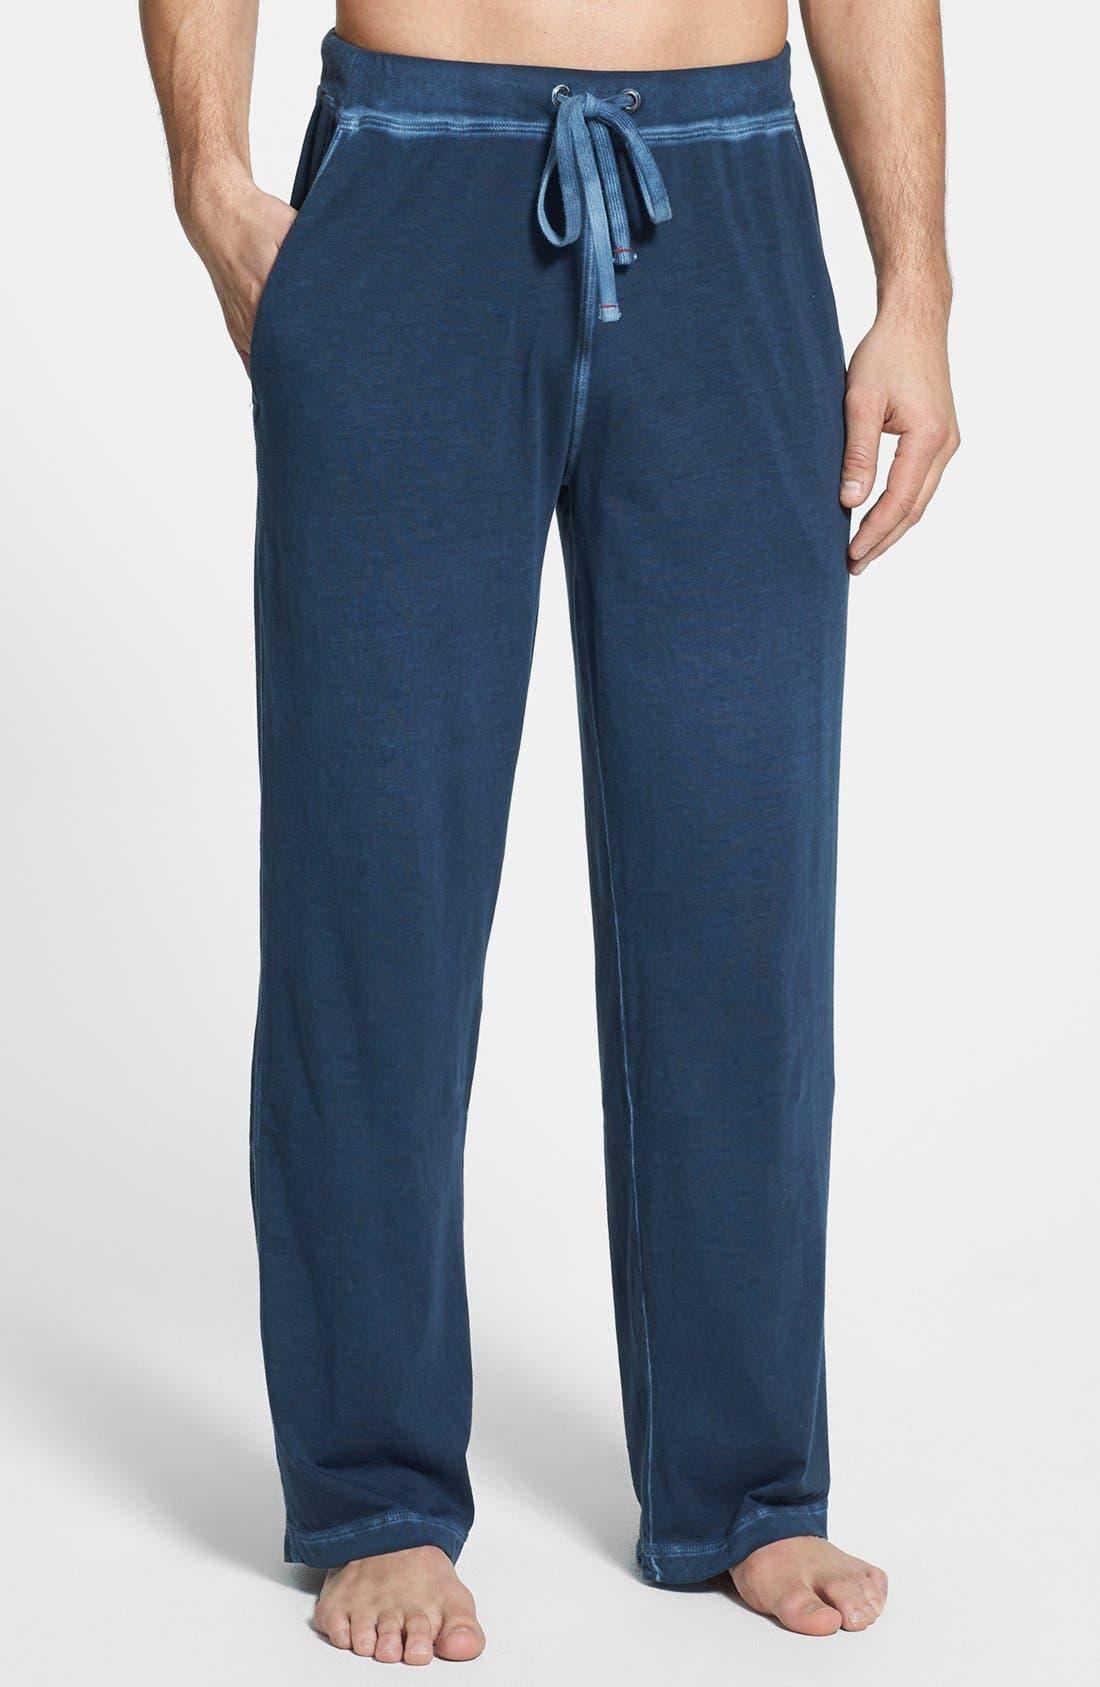 Alternate Image 1 Selected - Daniel Buchler Peruvian Pima Cotton Lounge Pants